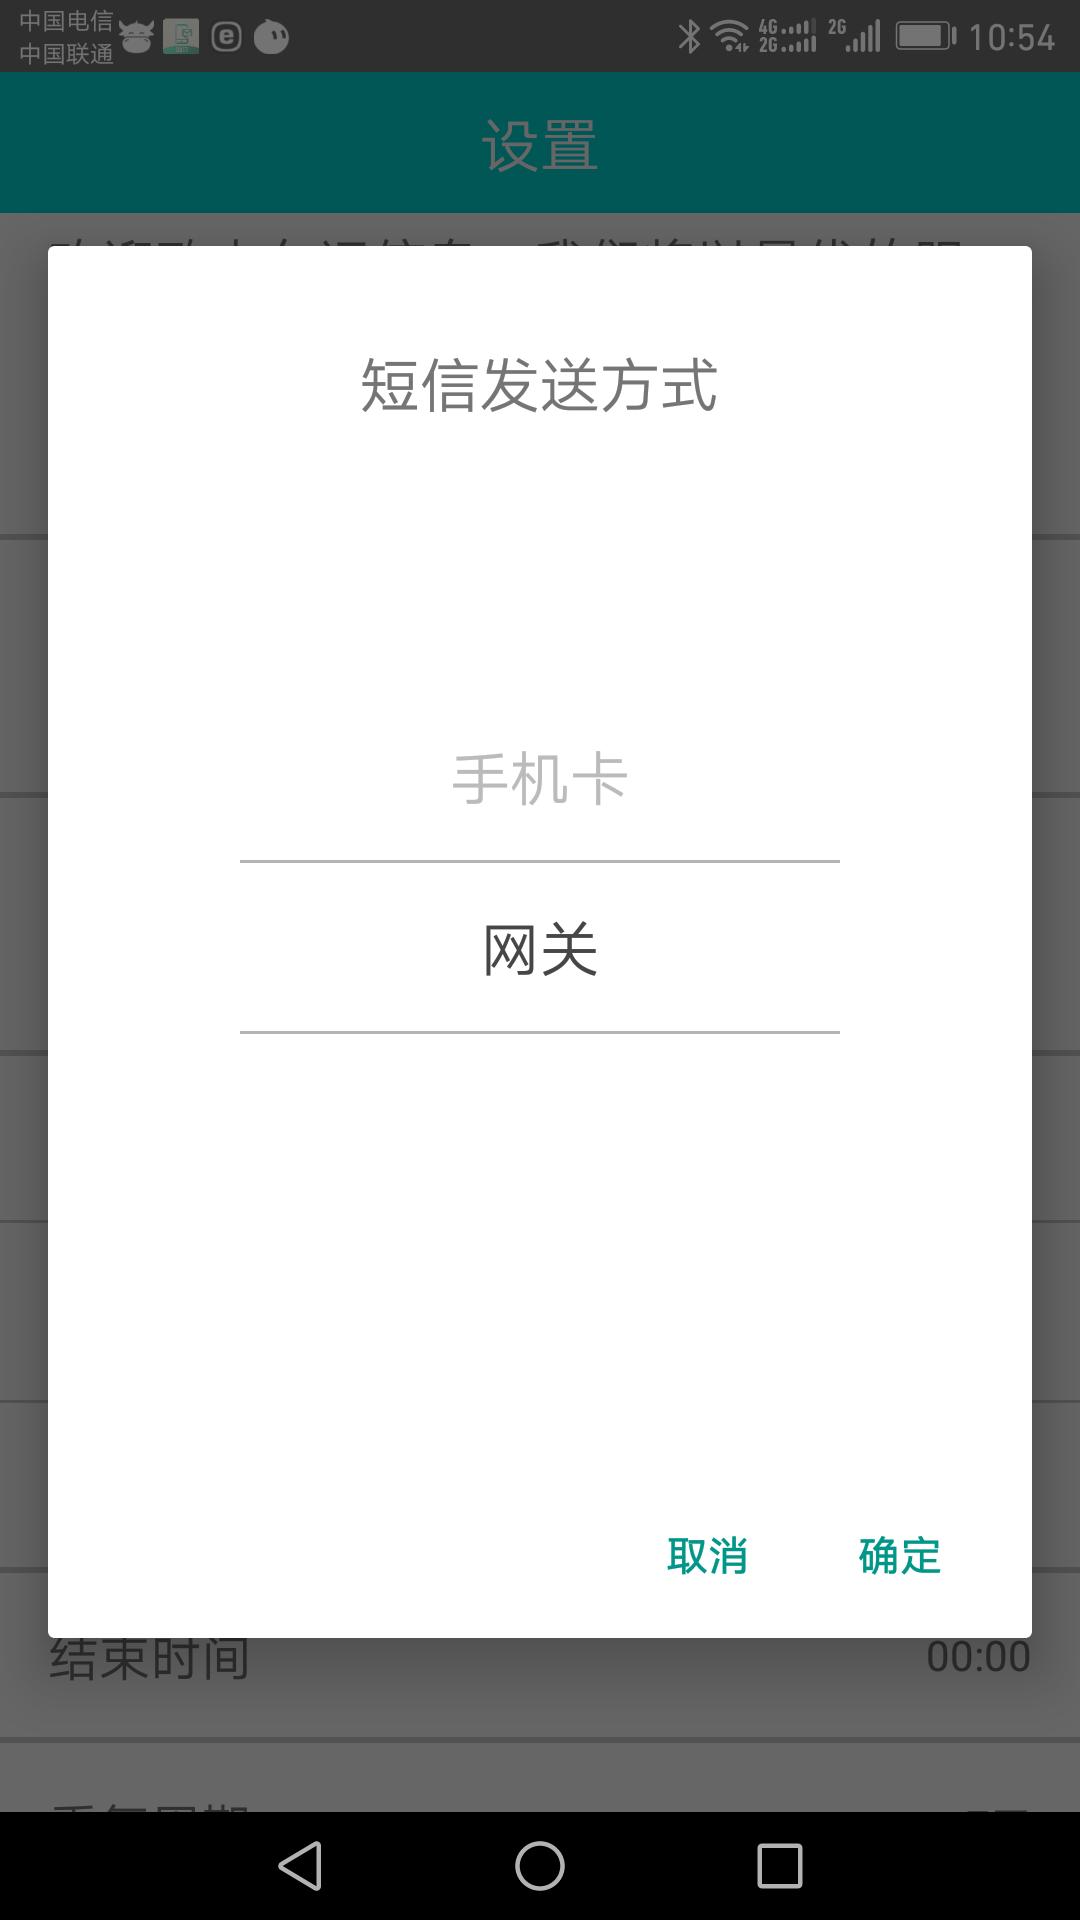 Screenshot_20170218-105430.png